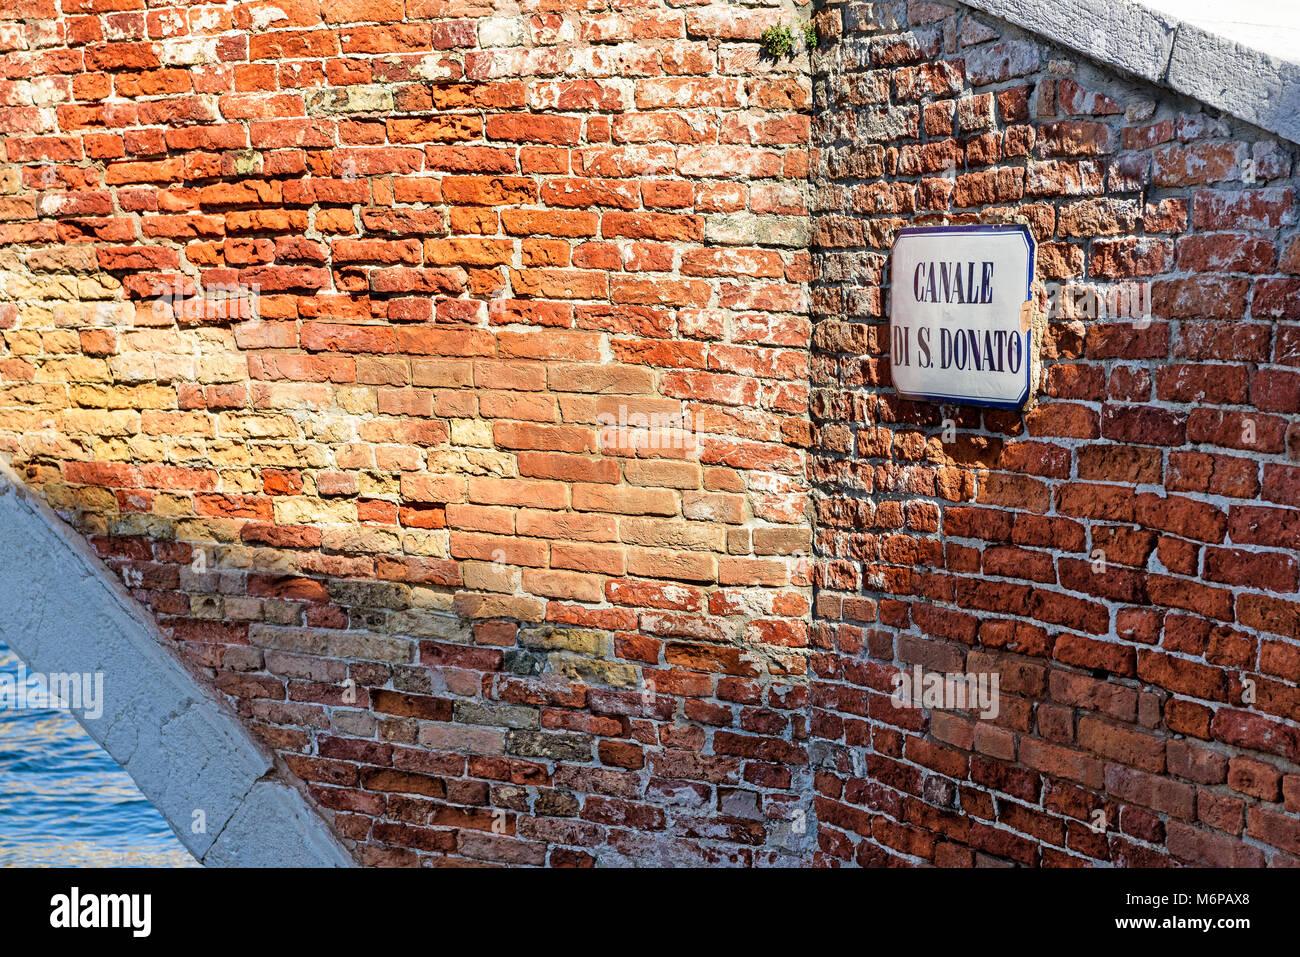 Canale di San Donato road name sign on red brick wall, Murano island, Venice, Italy - Stock Image